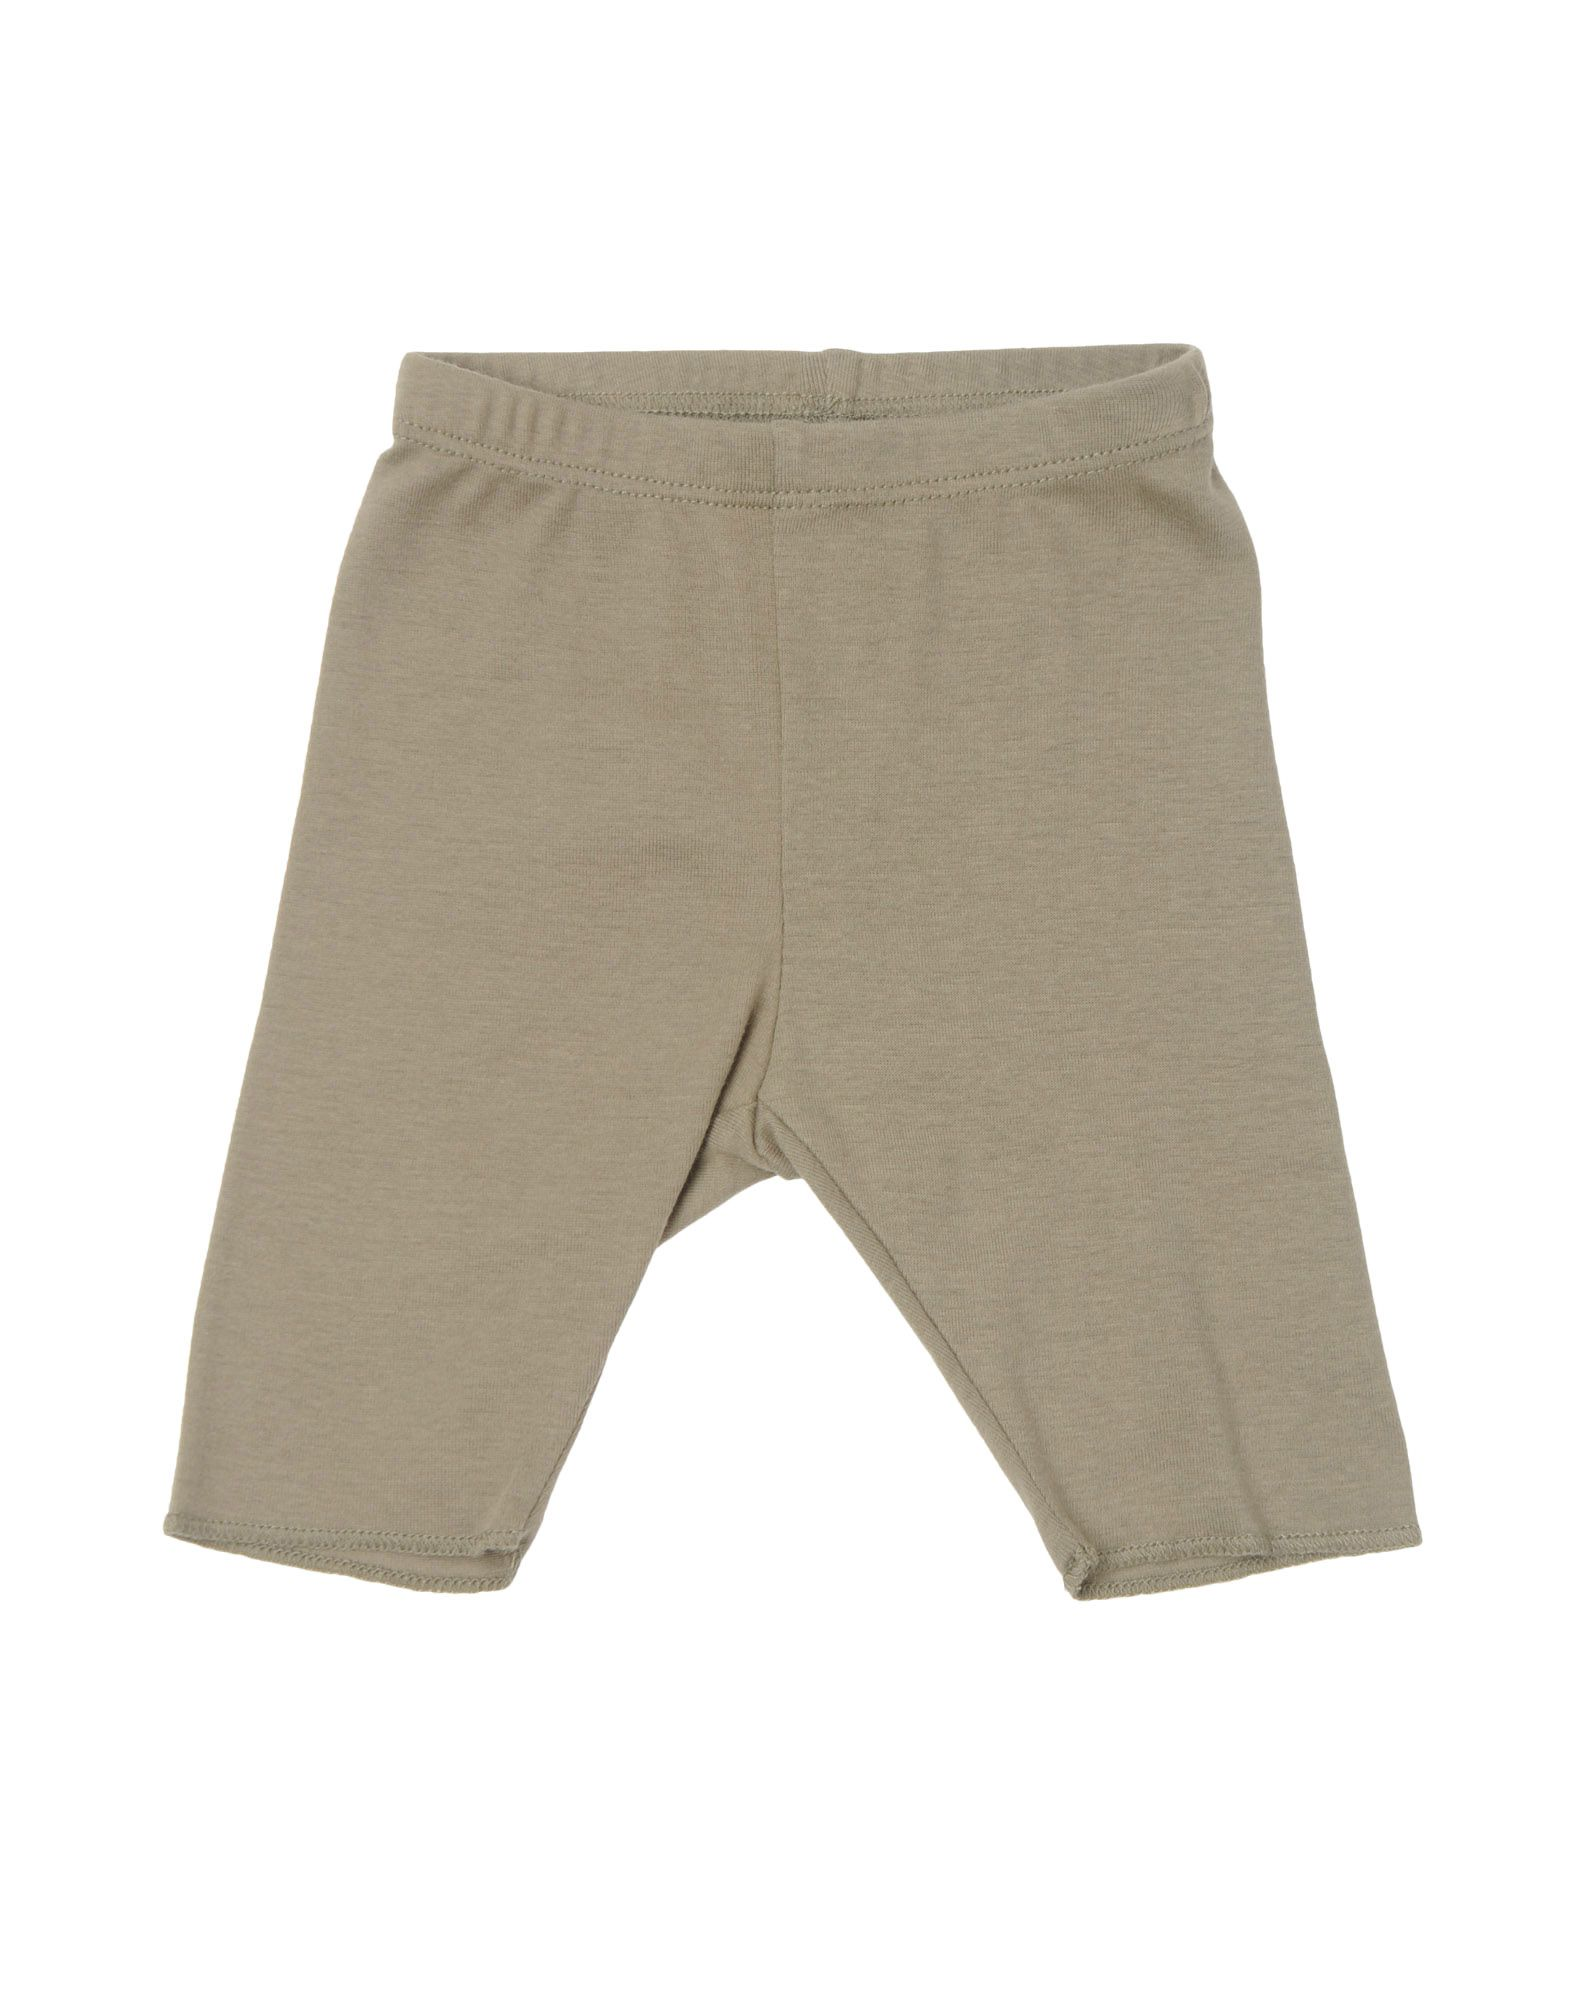 DOUUOD Mädchen 0-24 monate Leggings Farbe Militärgrün Größe 10